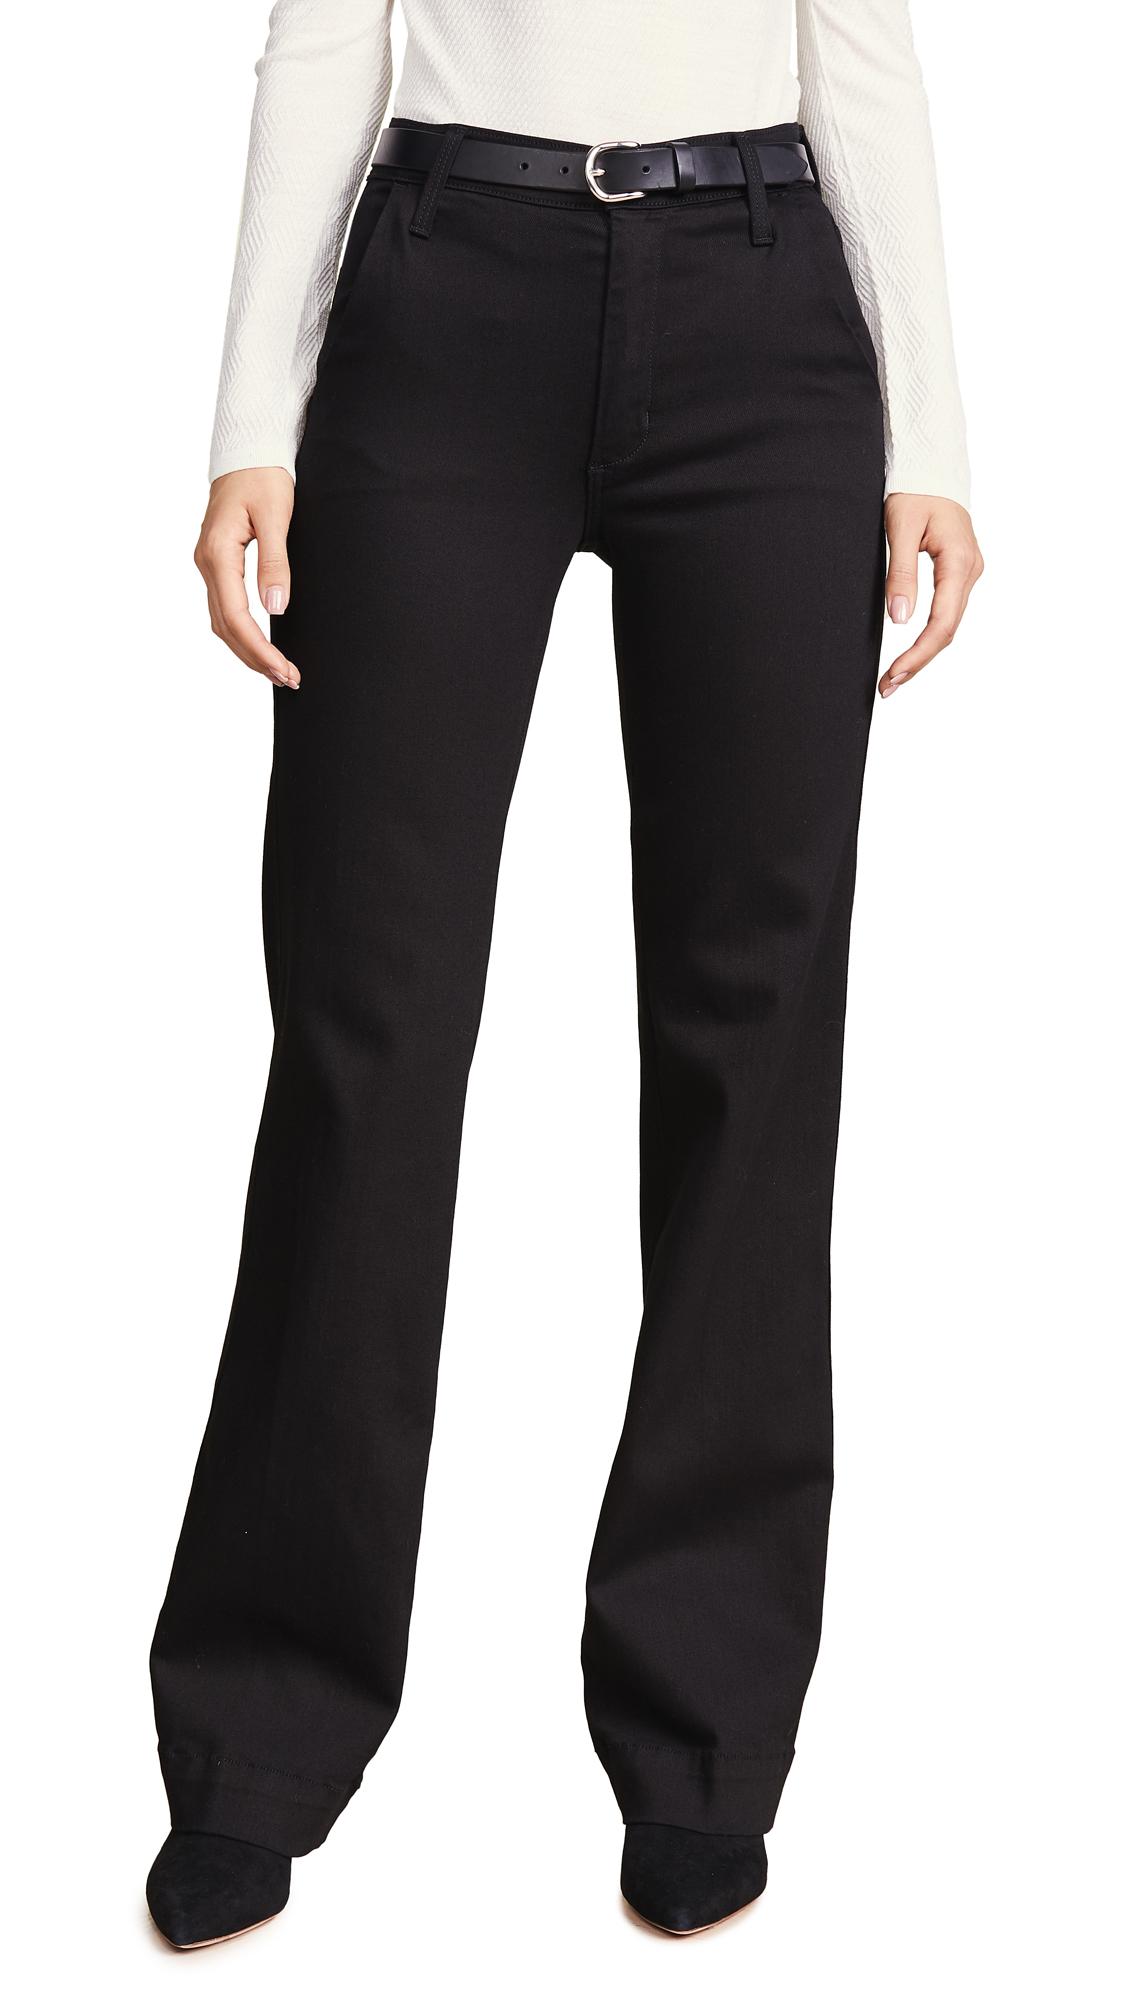 JAMES JEANS Jhene Trouser Jeans in Flat Black